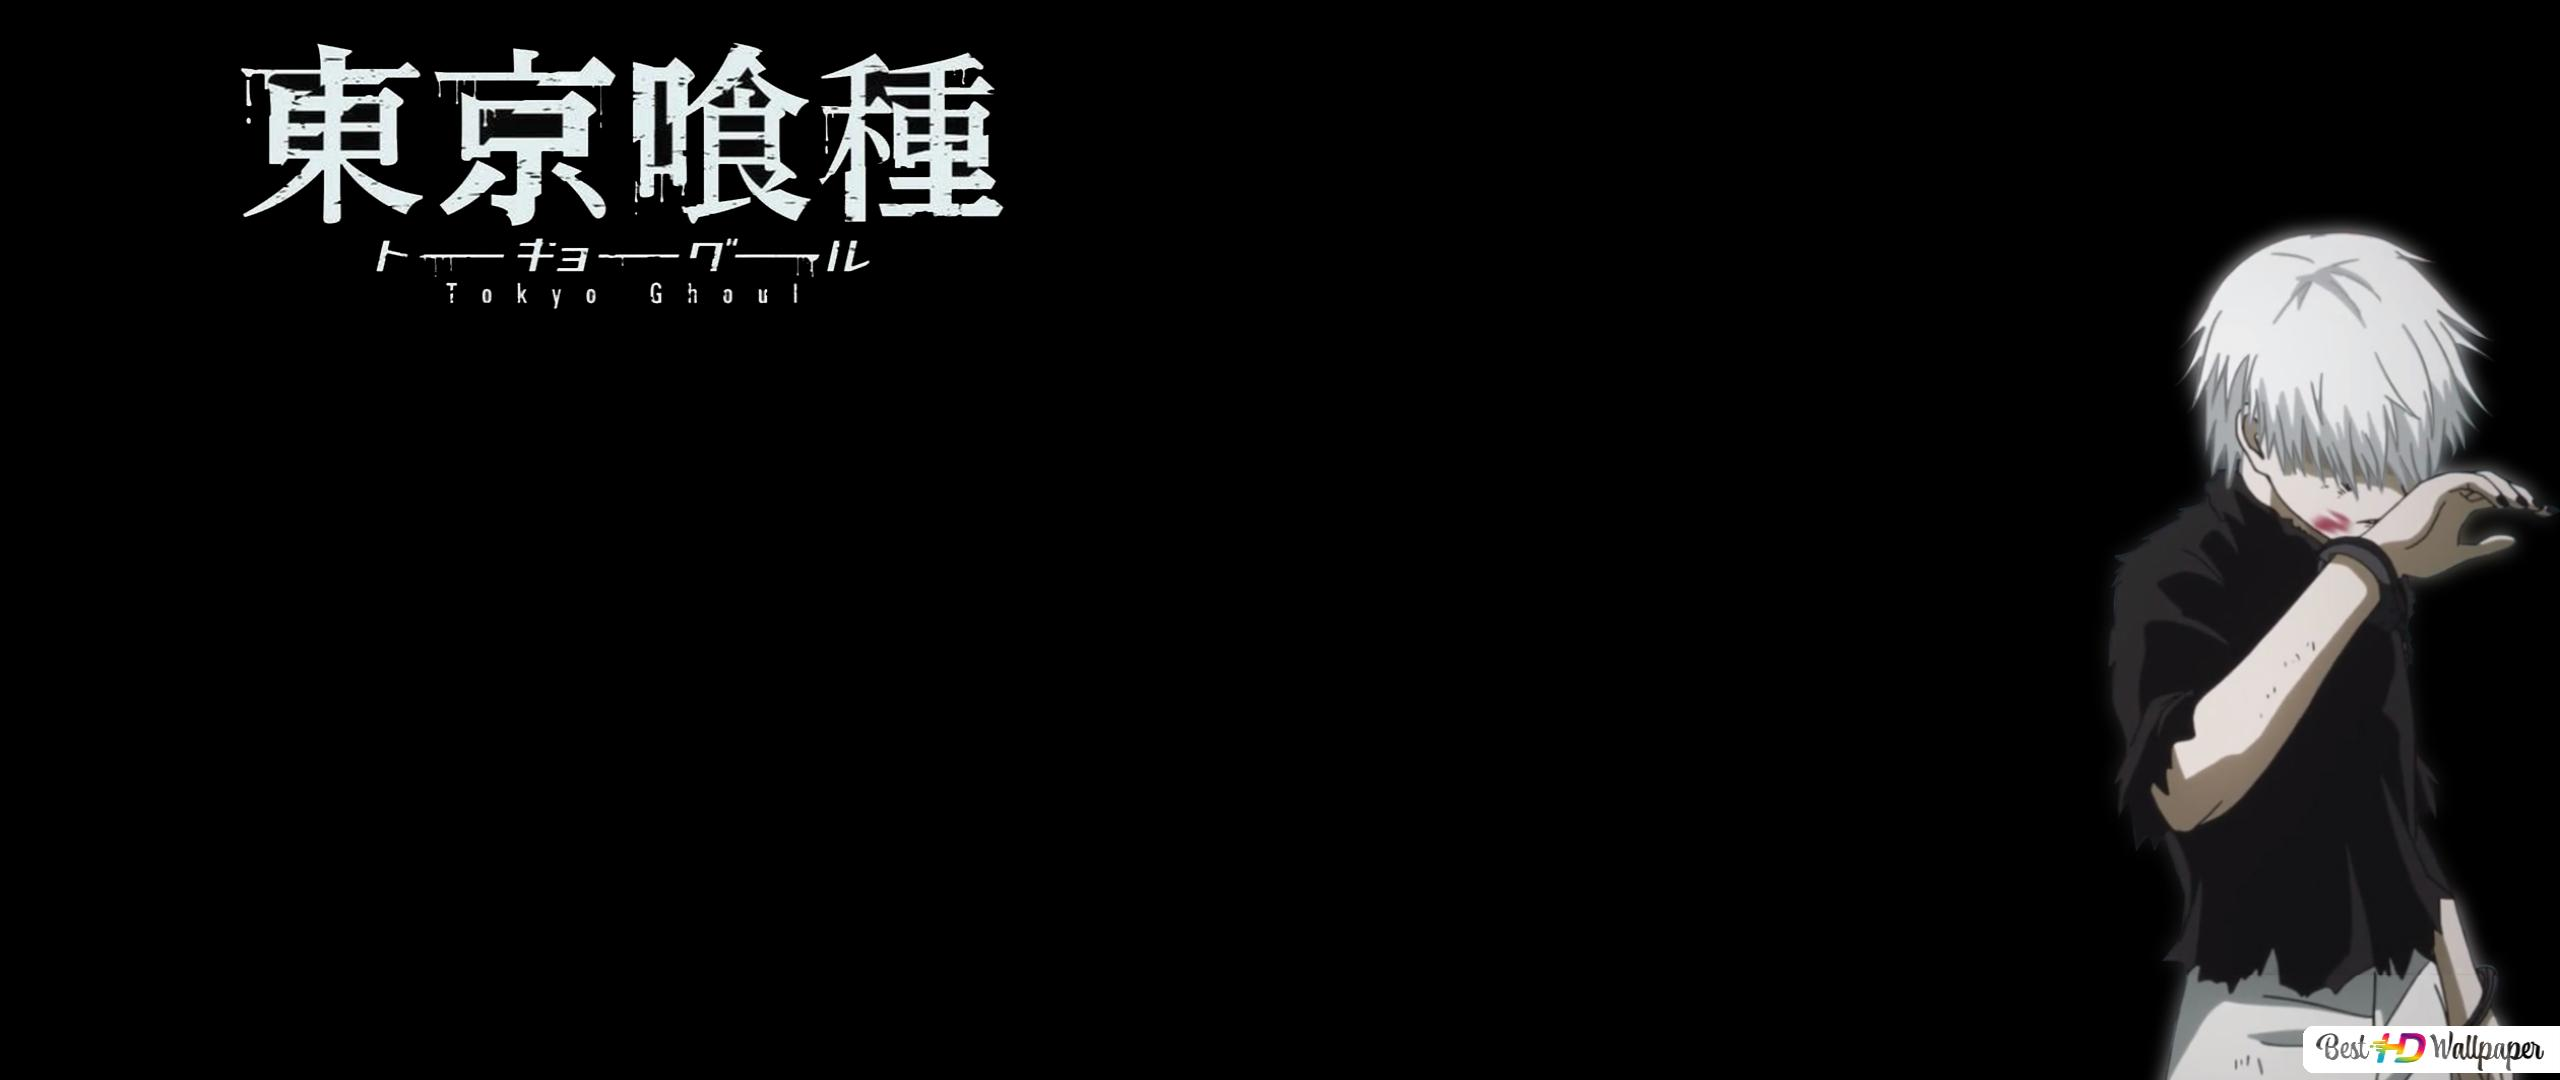 Tokyo Ghoul Kaneki Ken Ghoul Hd Wallpaper Download